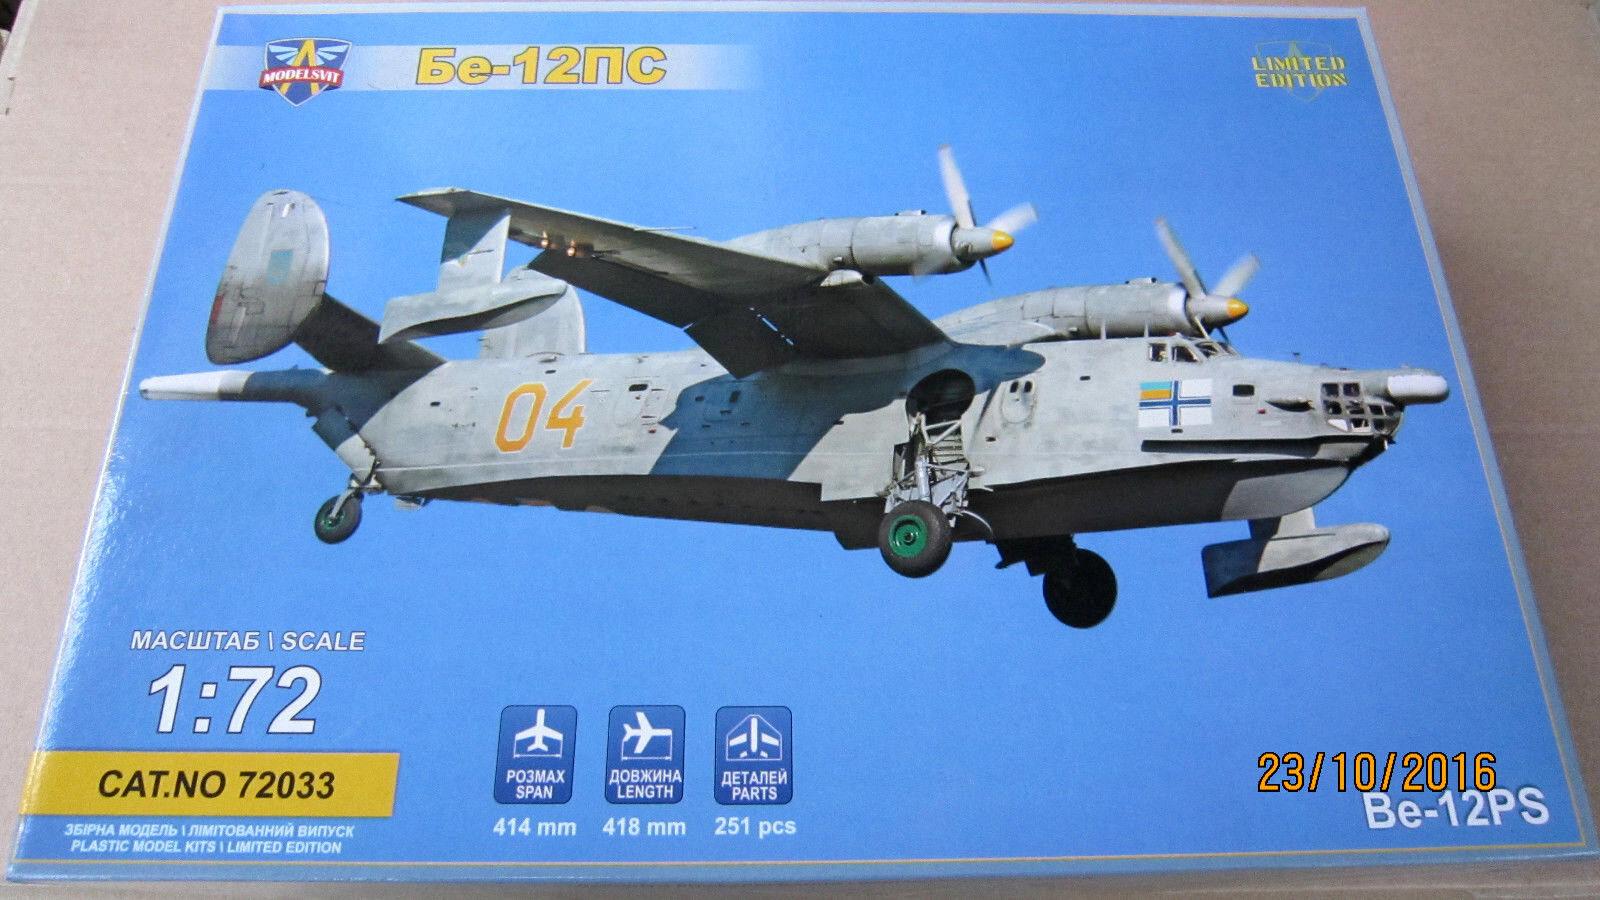 Beriev Be-12PS 'Chayka Mail' Reconnaissance Aircraft 1 72 Modelsvit